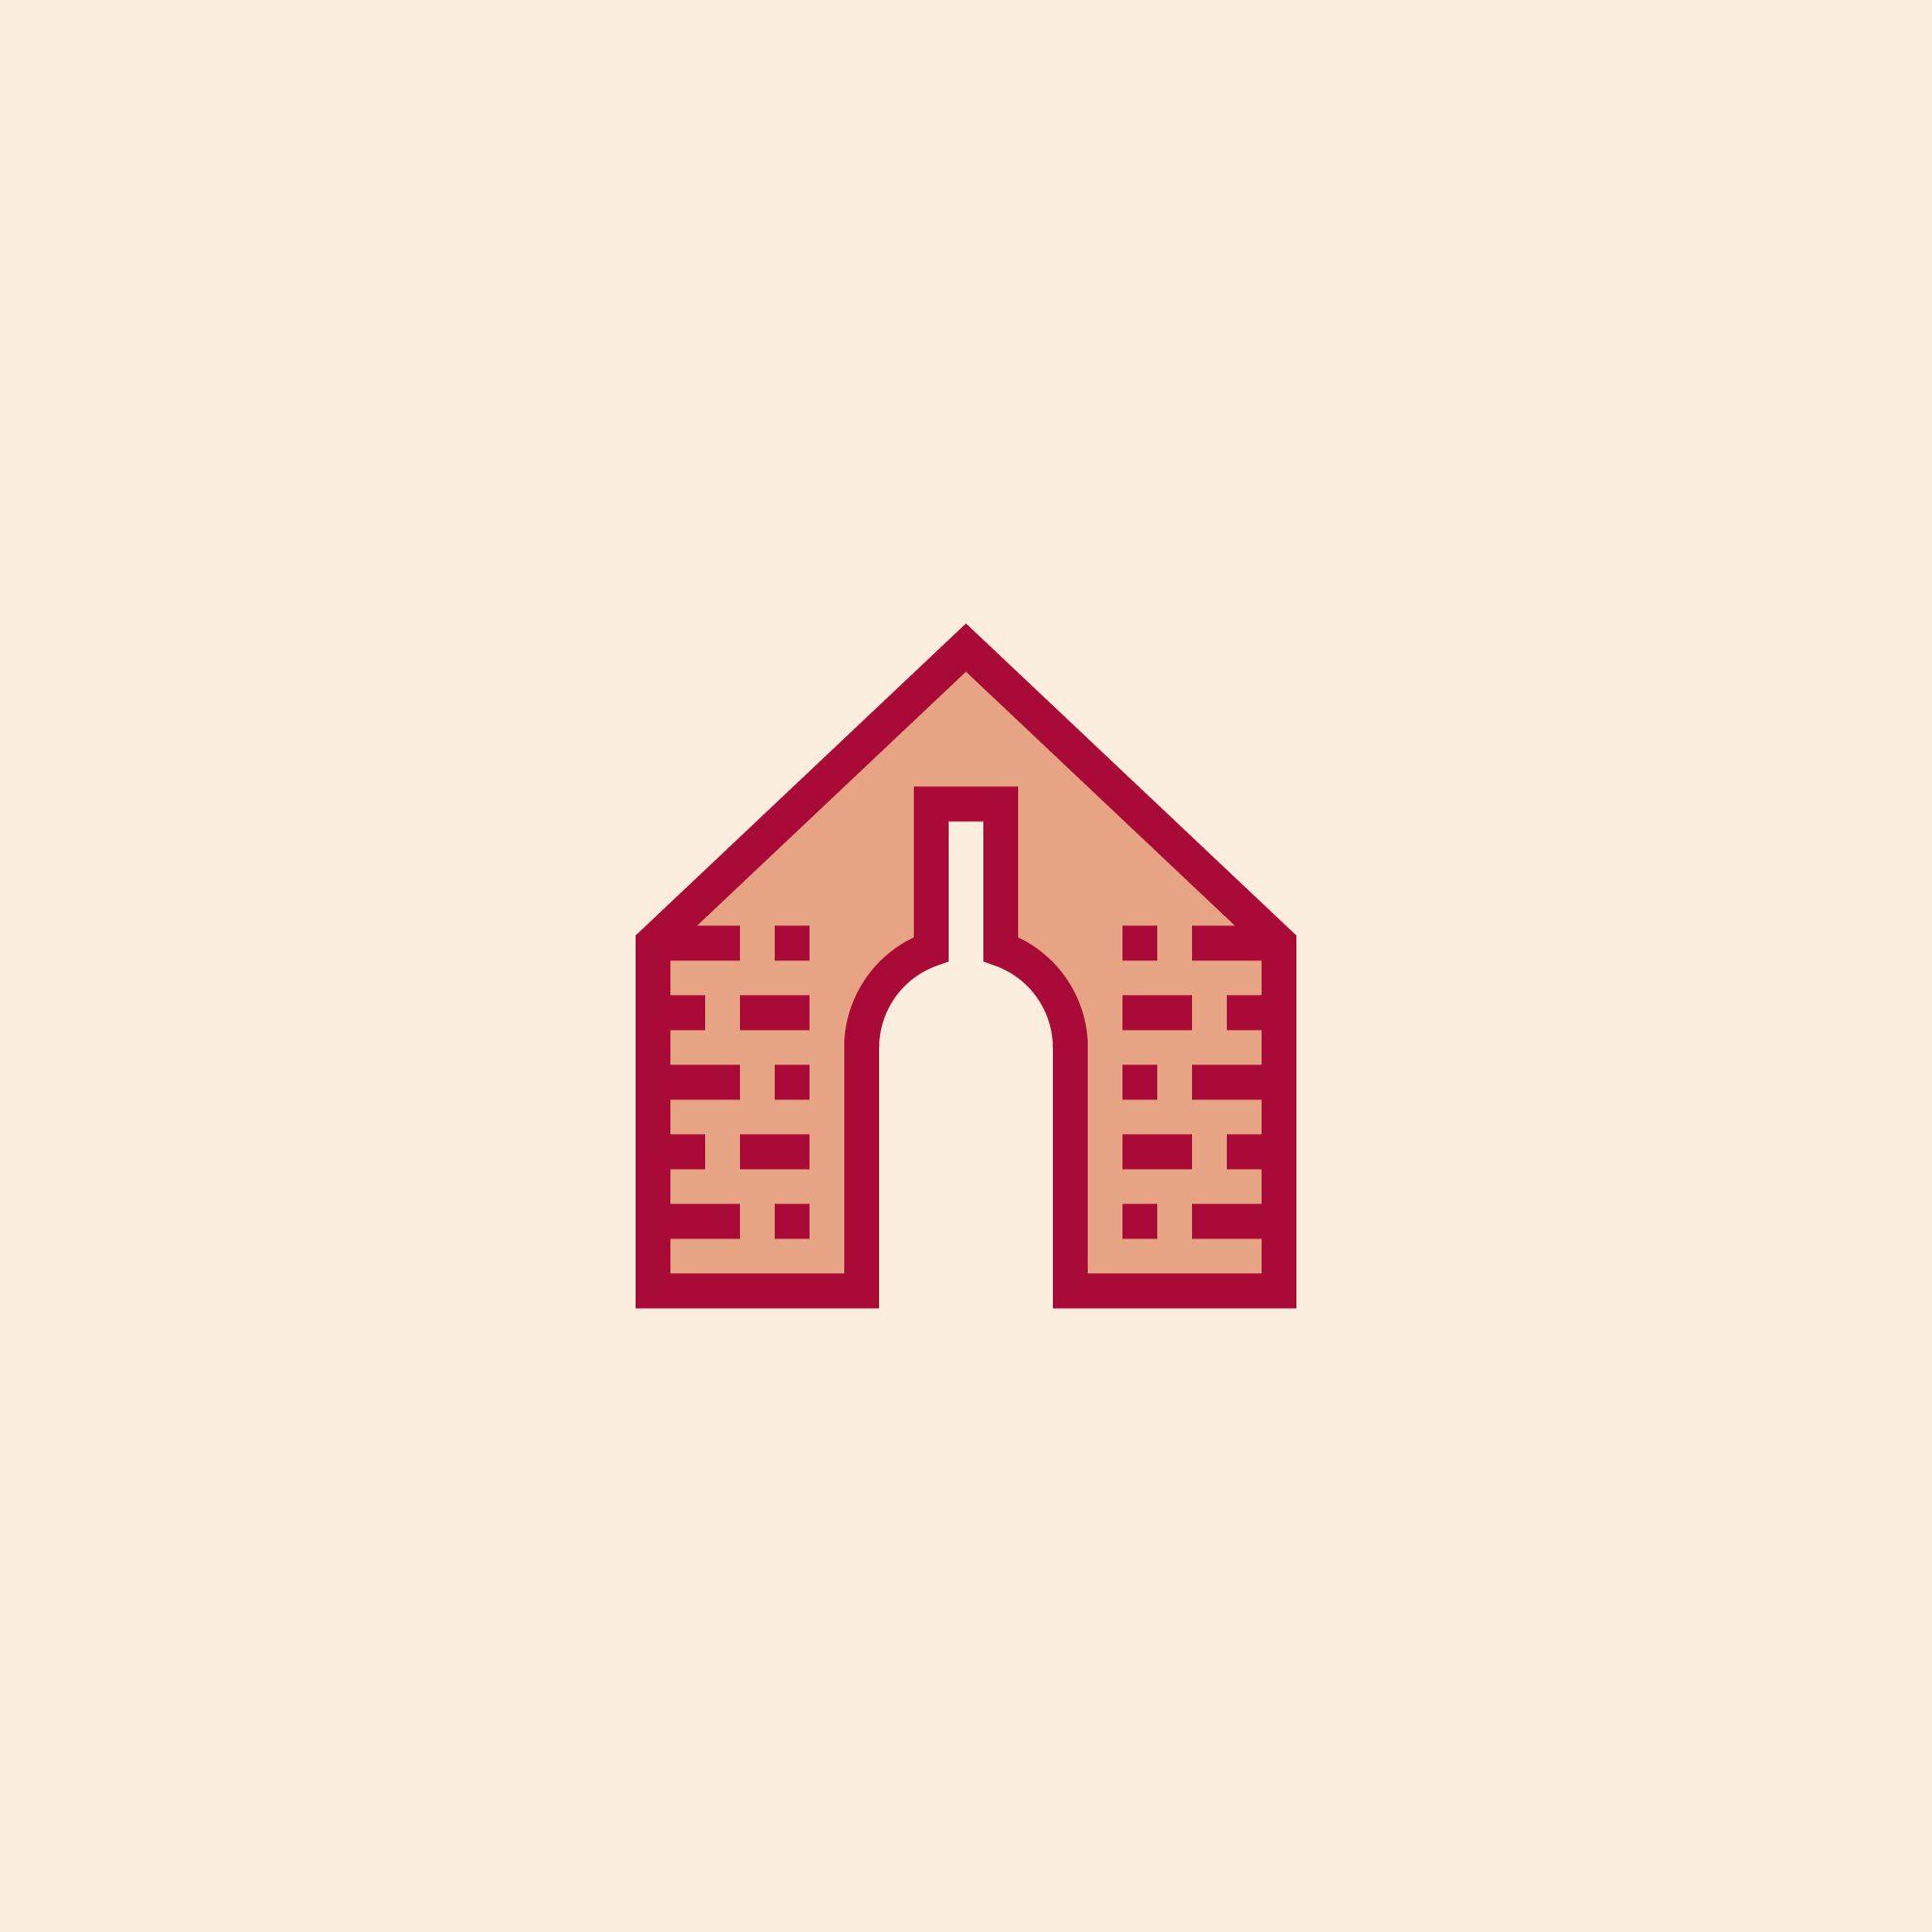 Wine Cellar Logo Wine Home Logo Wine House Logo Wine Shop Logo Exclusive Logo Home Logo Flat Logo Design Wine House